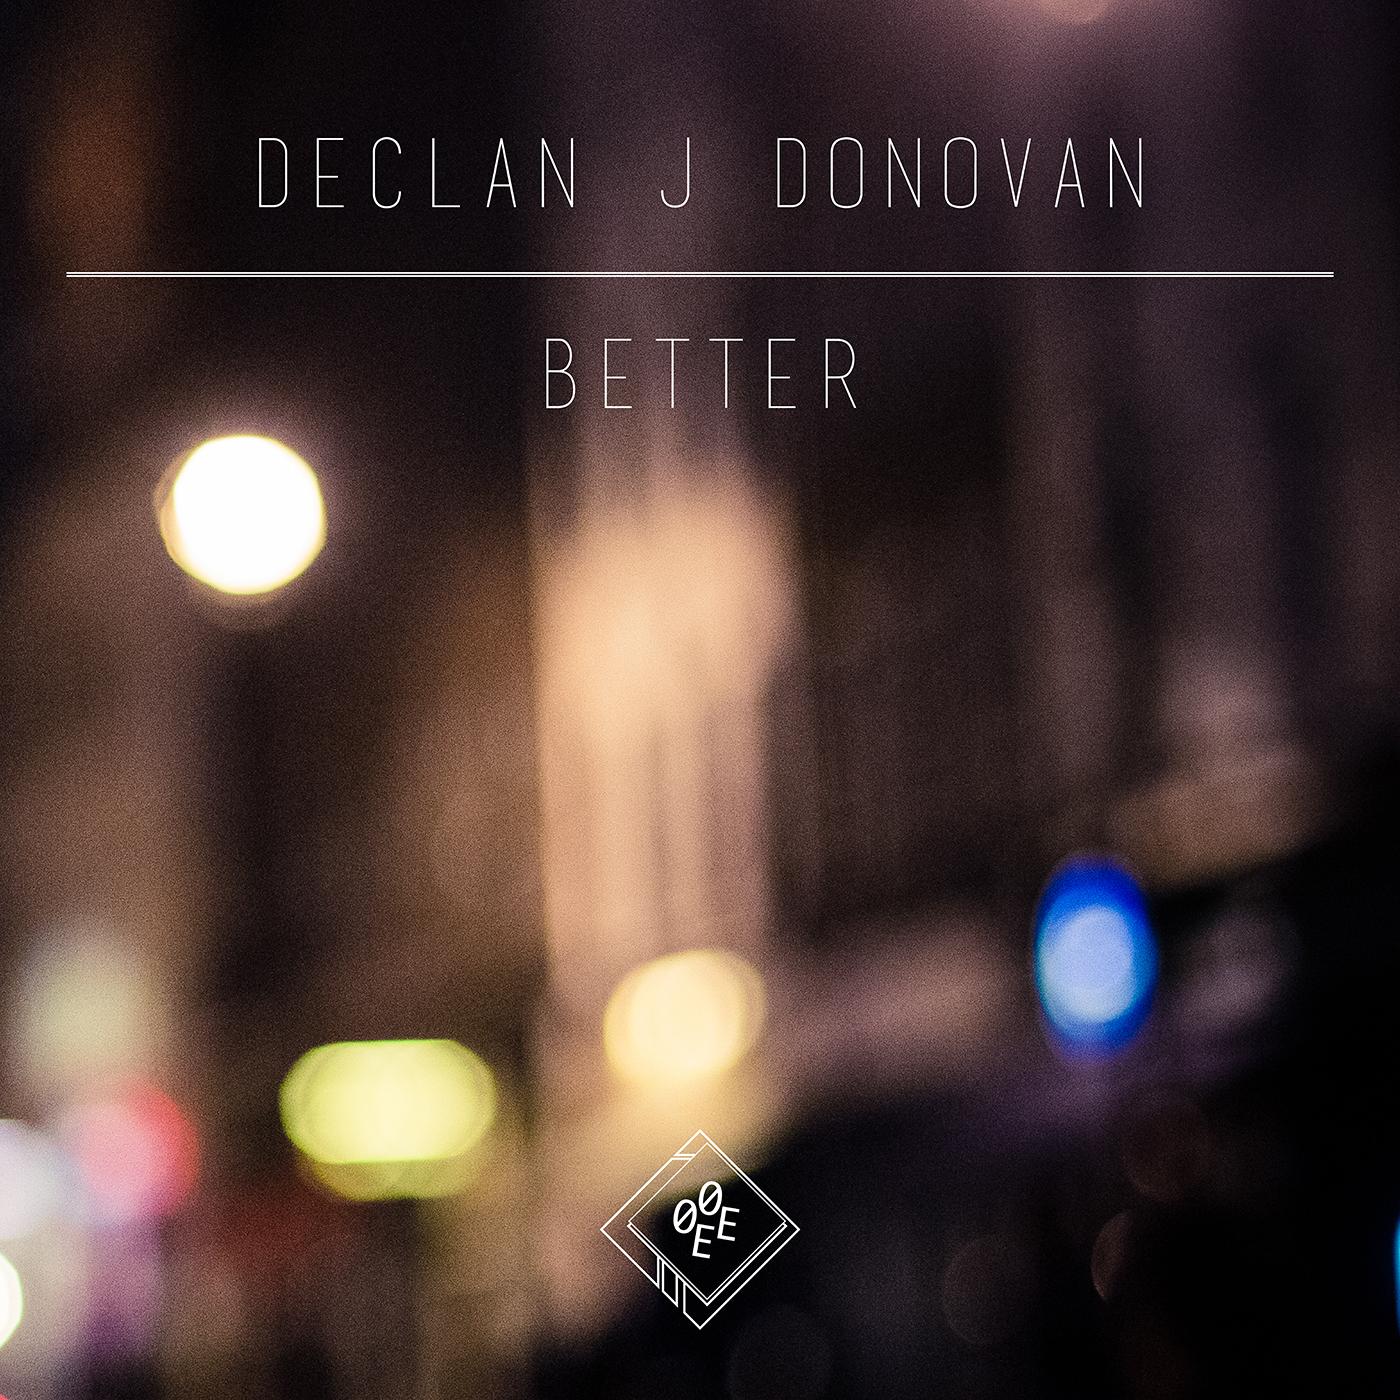 Declan J Donovan - Better